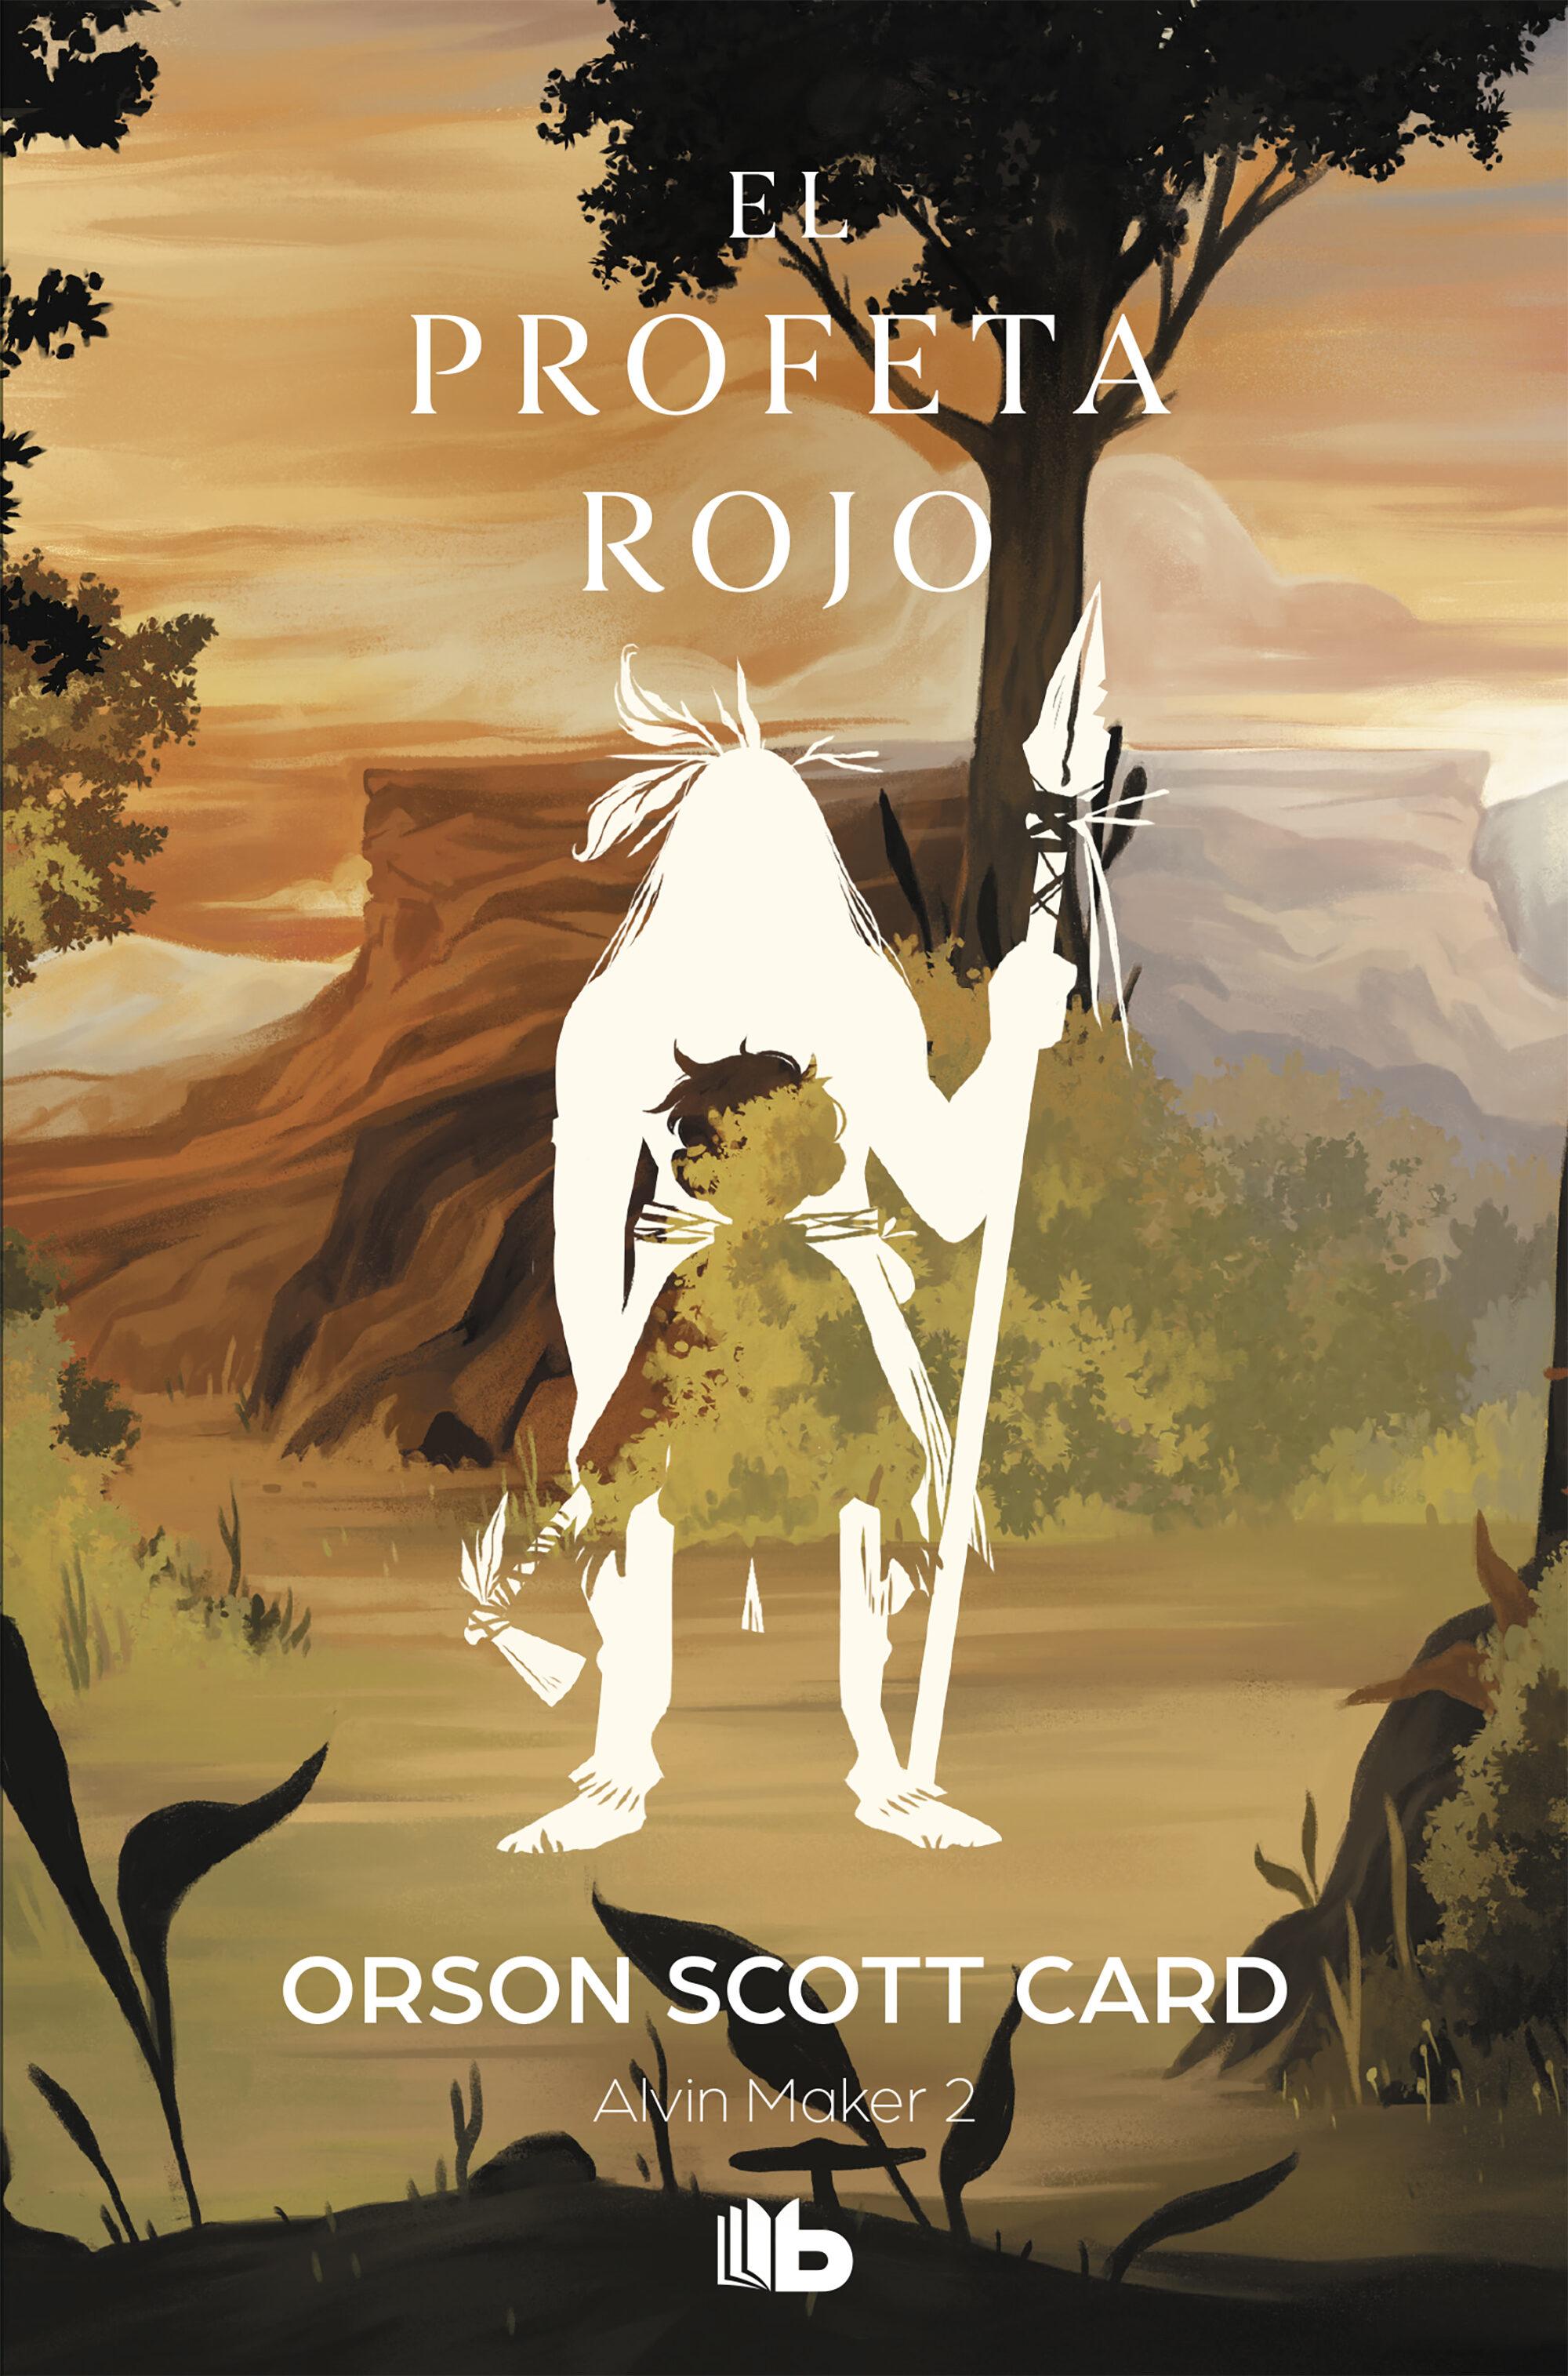 El Profeta Rojo (saga De Alvin Maker [el Hacedor] 2)   por Orson Scott Card epub